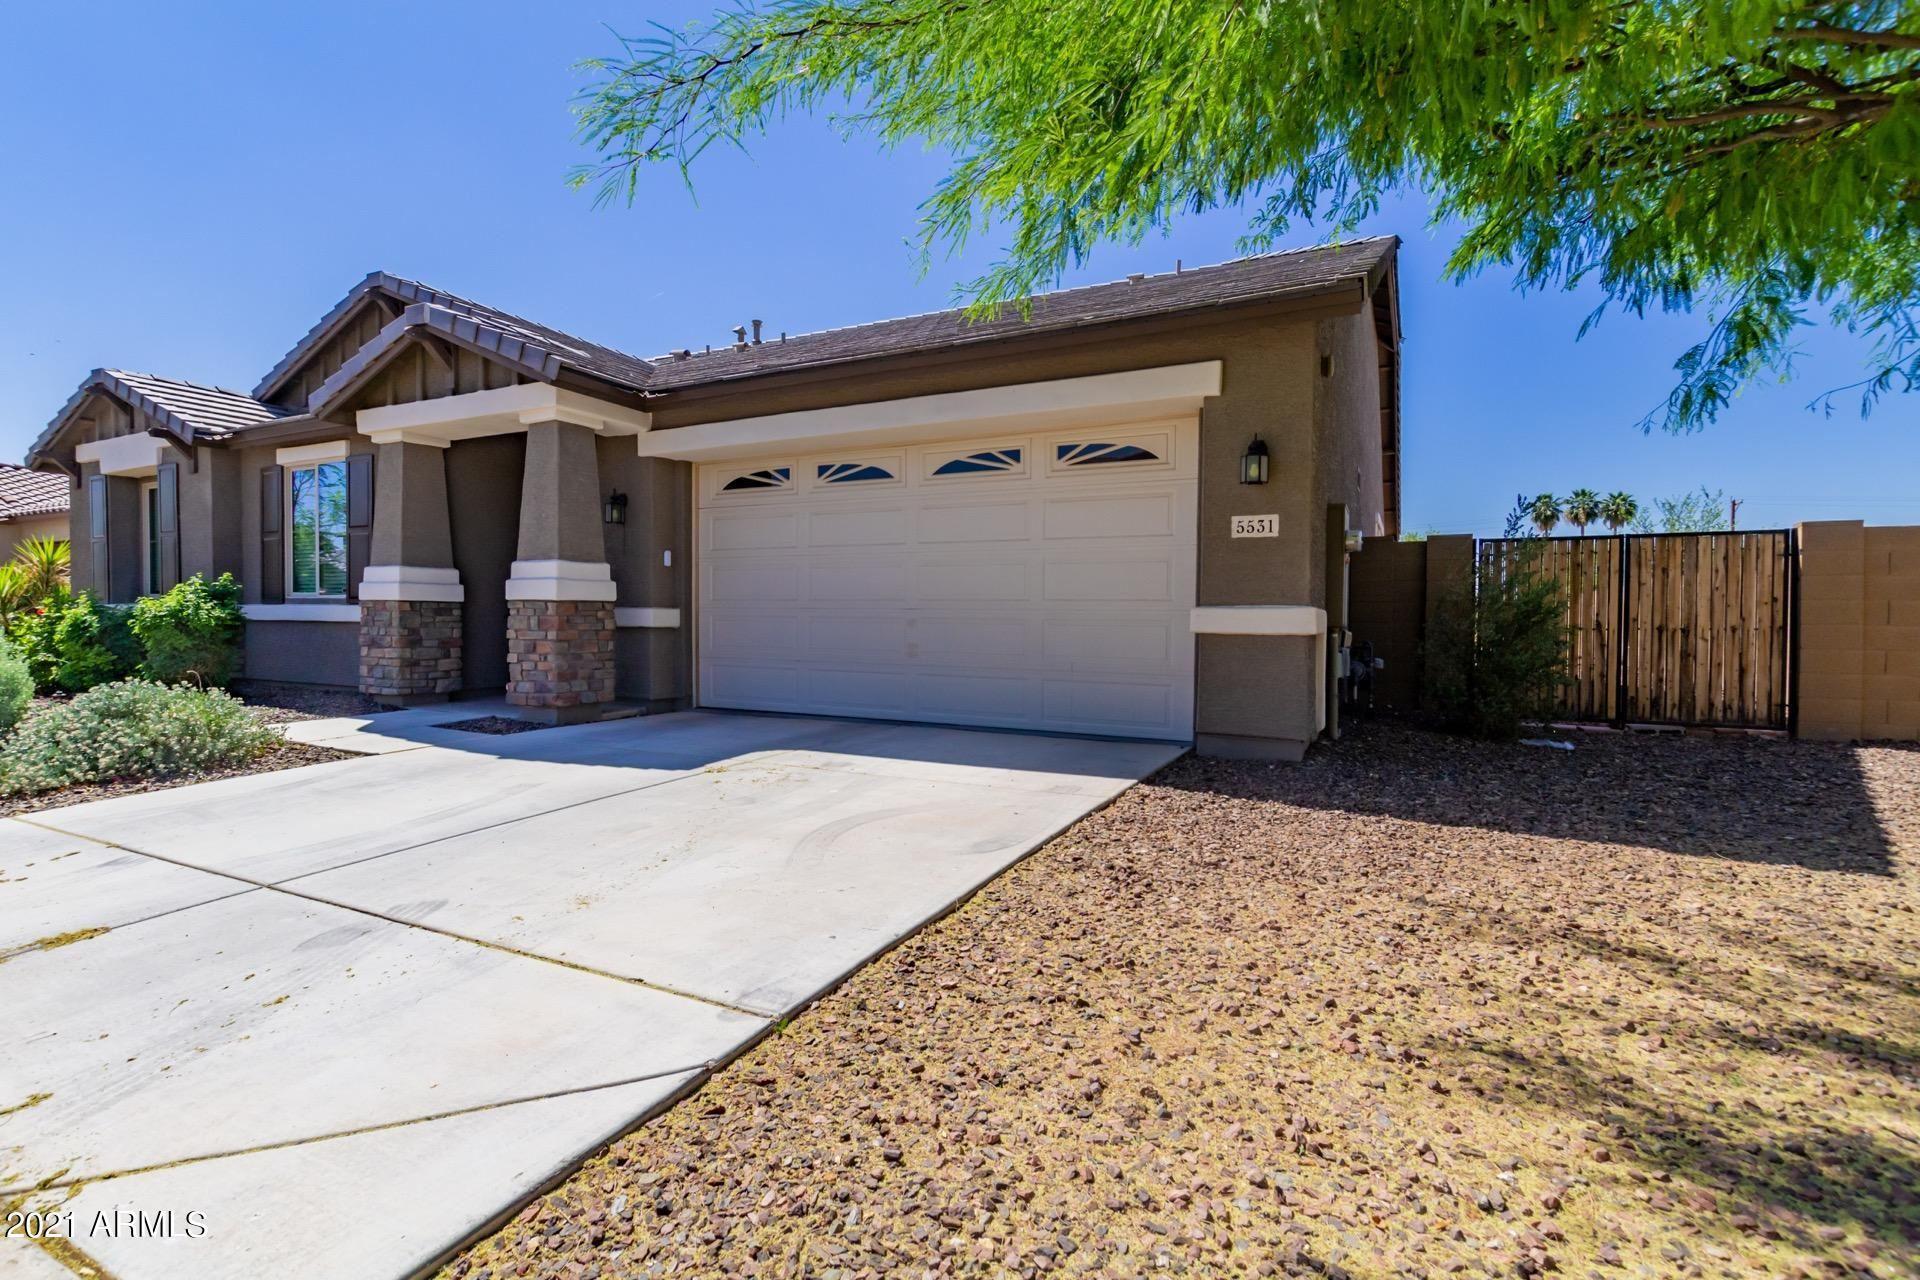 Photo of 5531 W MILADA Drive, Laveen, AZ 85339 (MLS # 6221644)